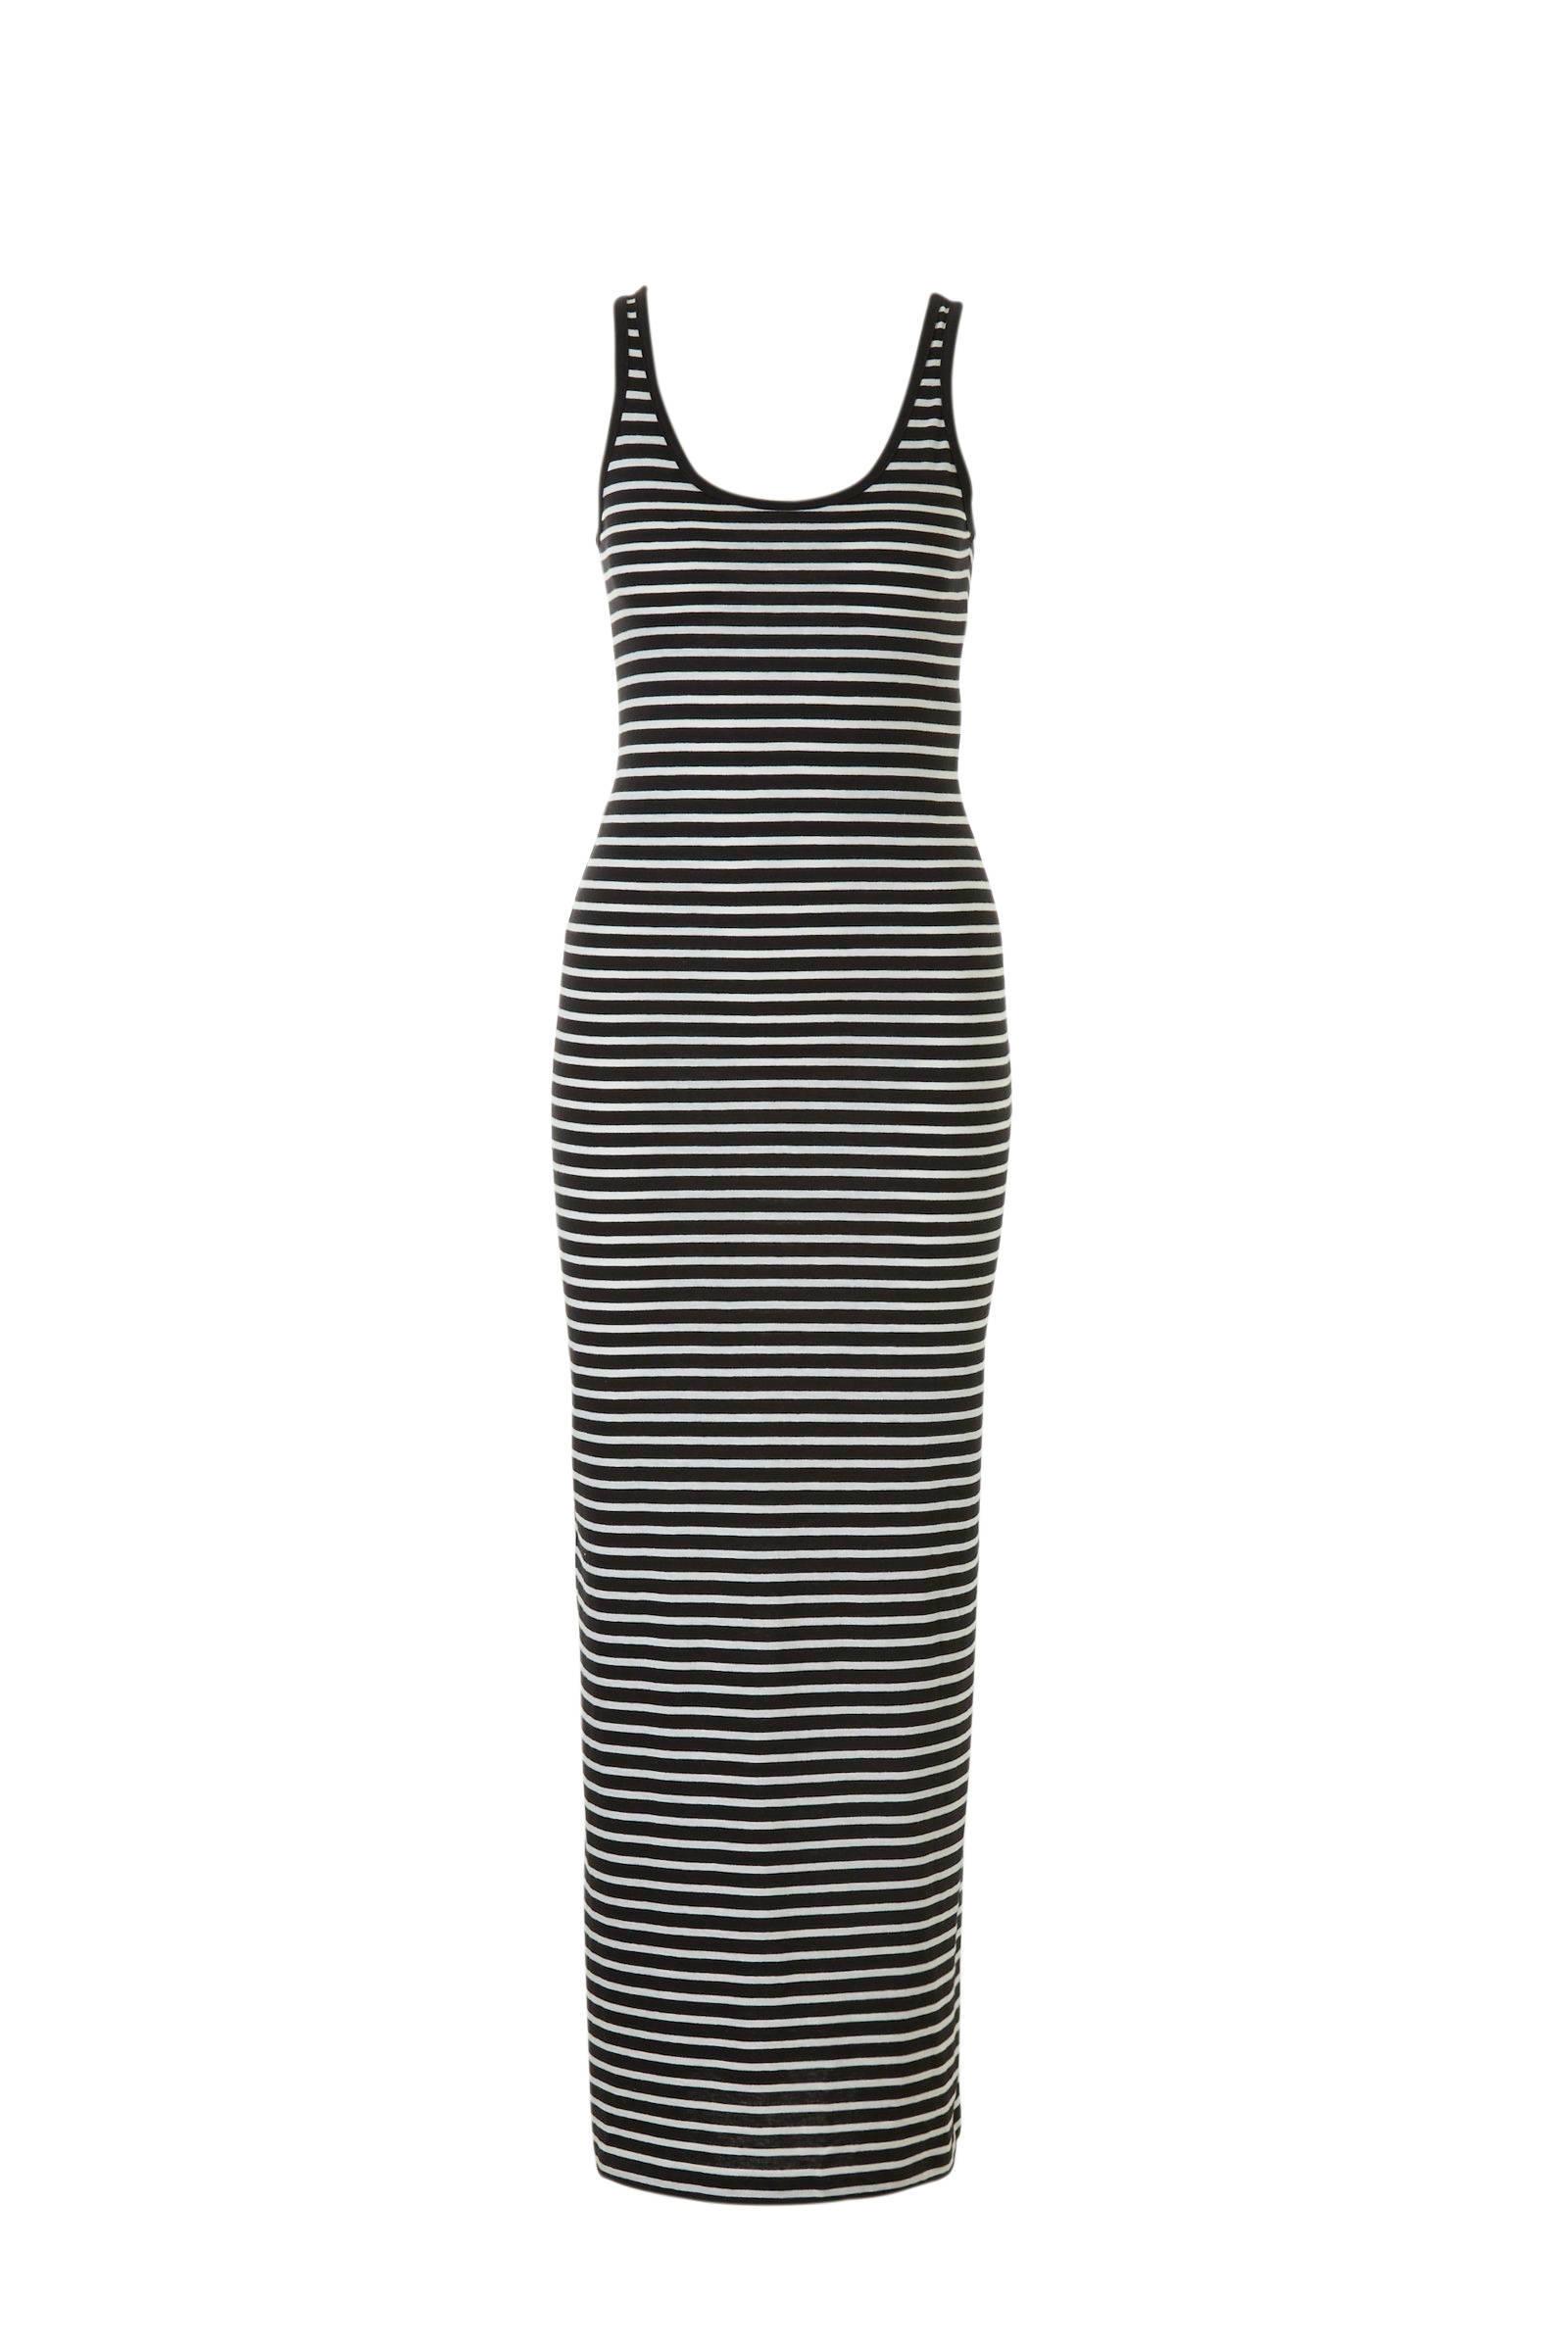 6fb9ebd179cc85 dames jurken   rokken bij wehkamp - Gratis bezorging vanaf 20.-